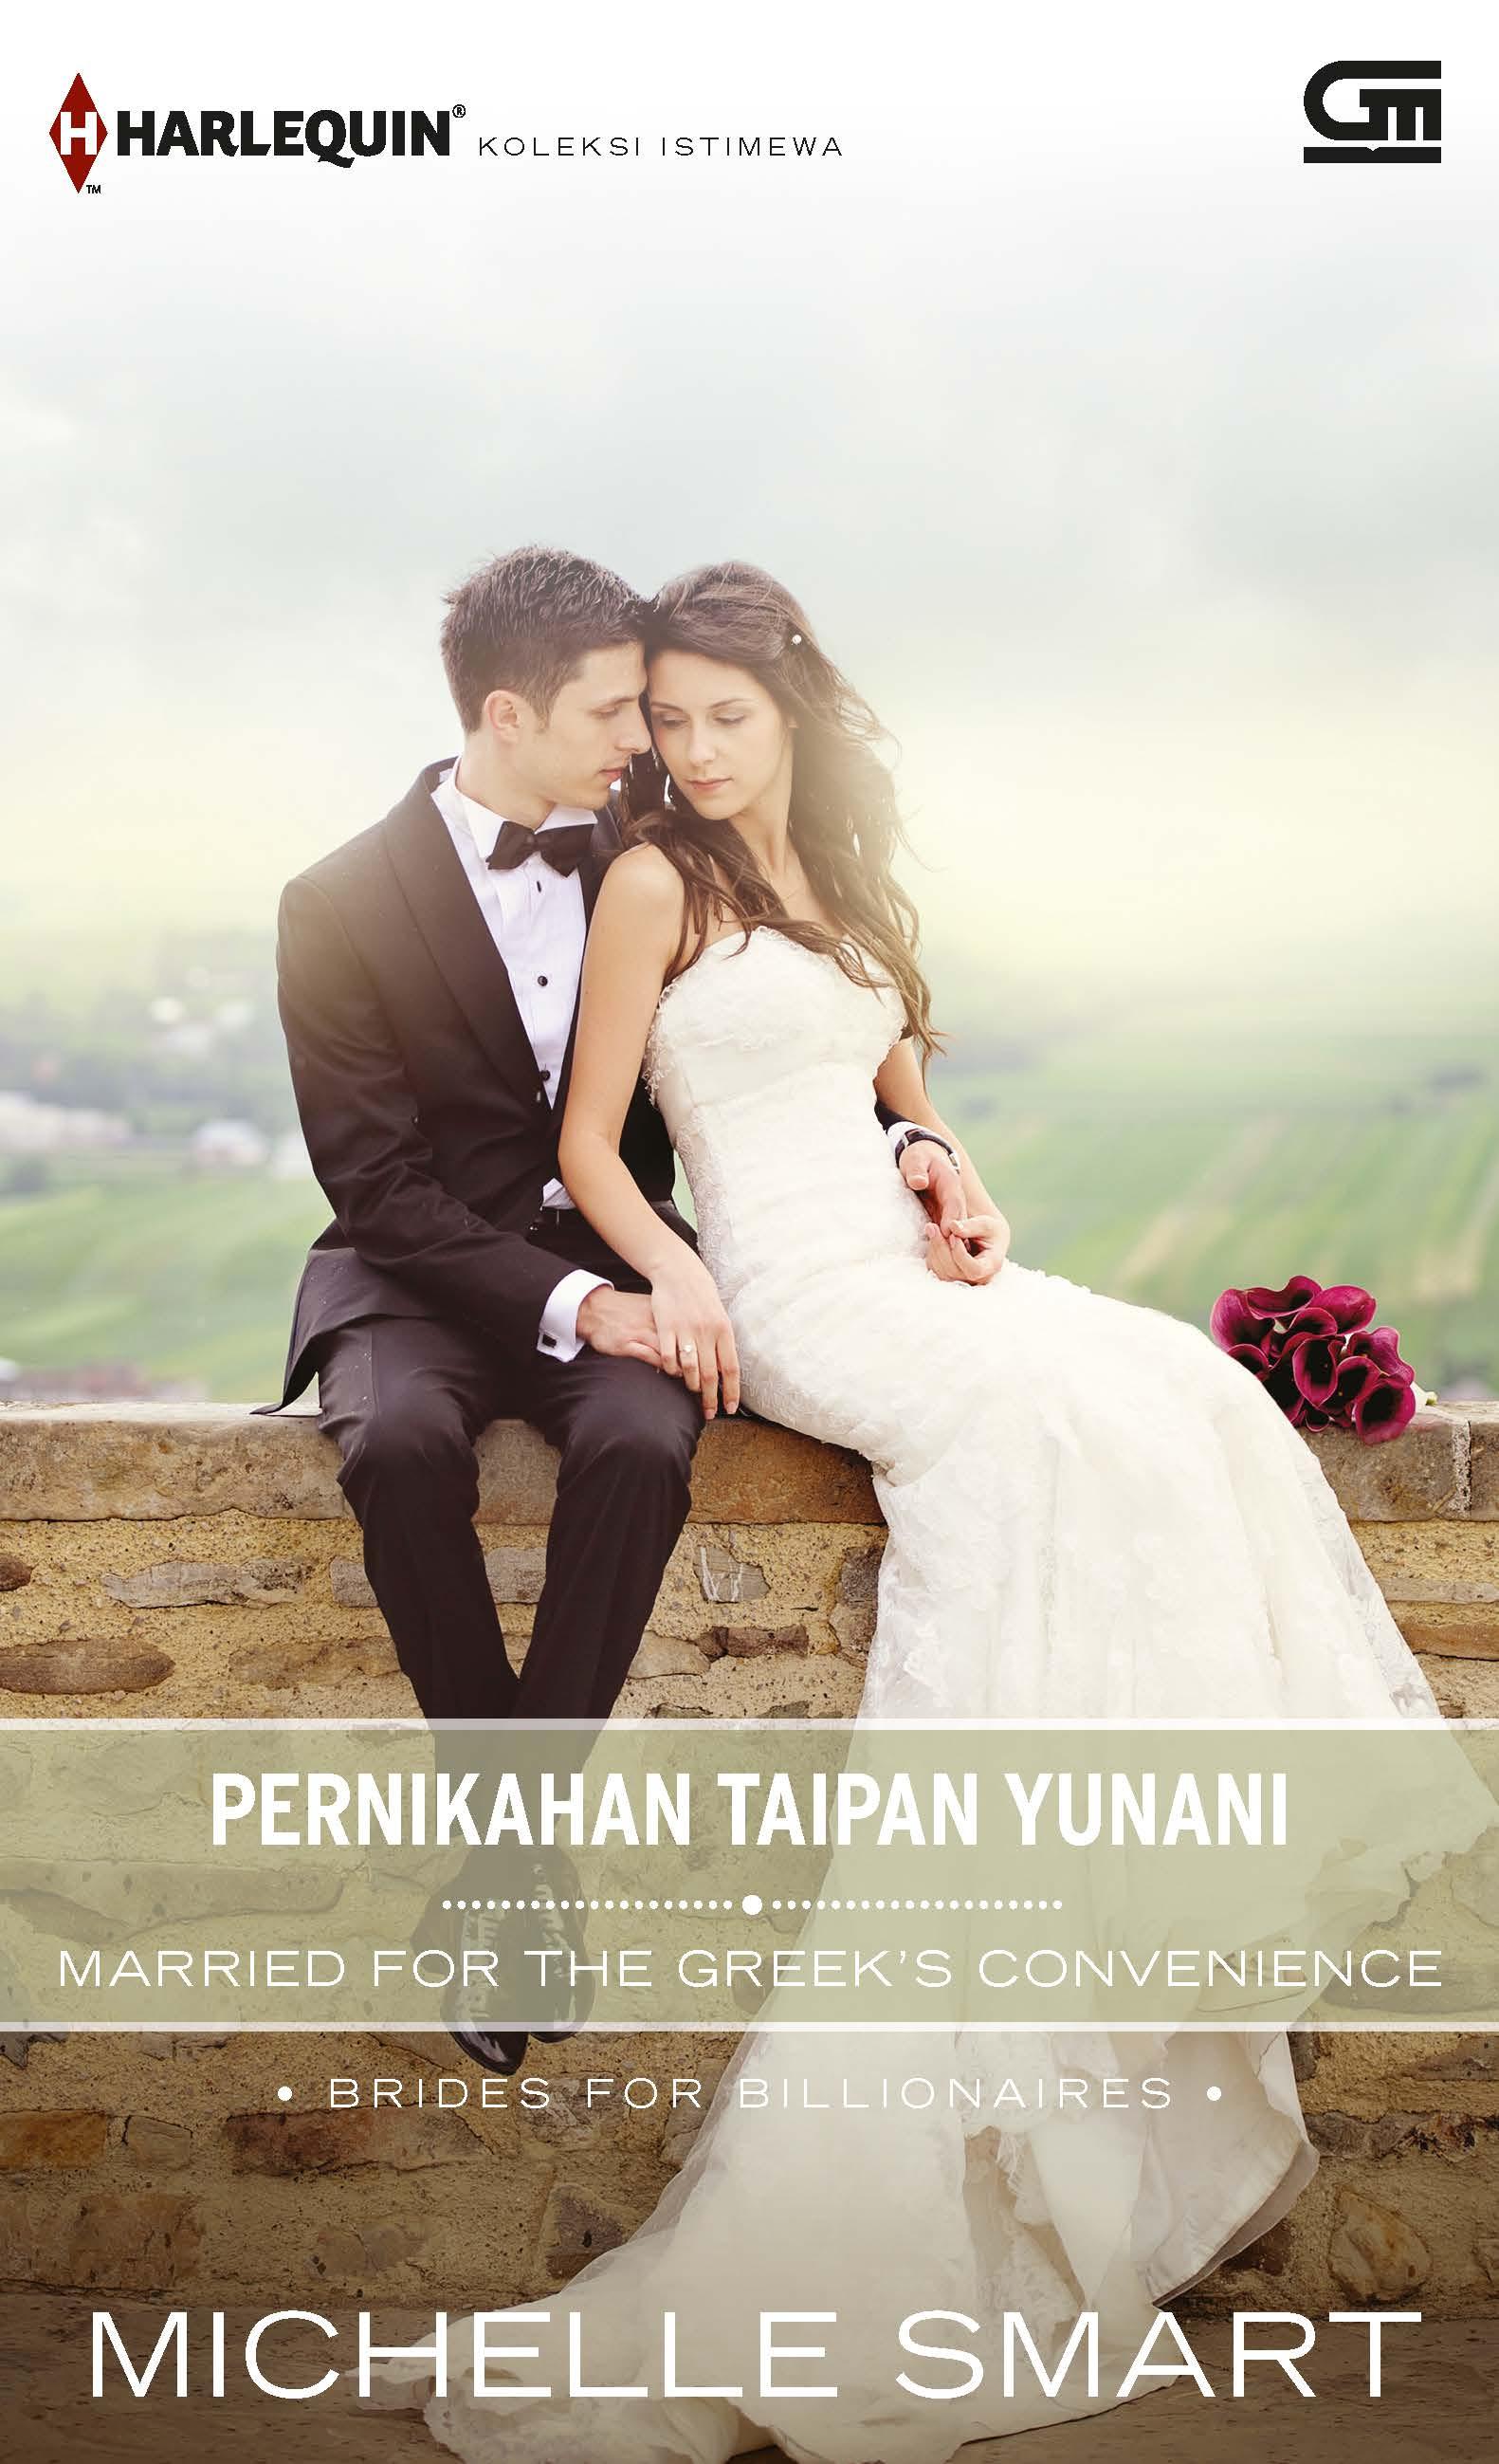 Harlequin Koleksi istimewa: Pernikahan Taipan Yunani (Married for the Greek\'s Convenience)